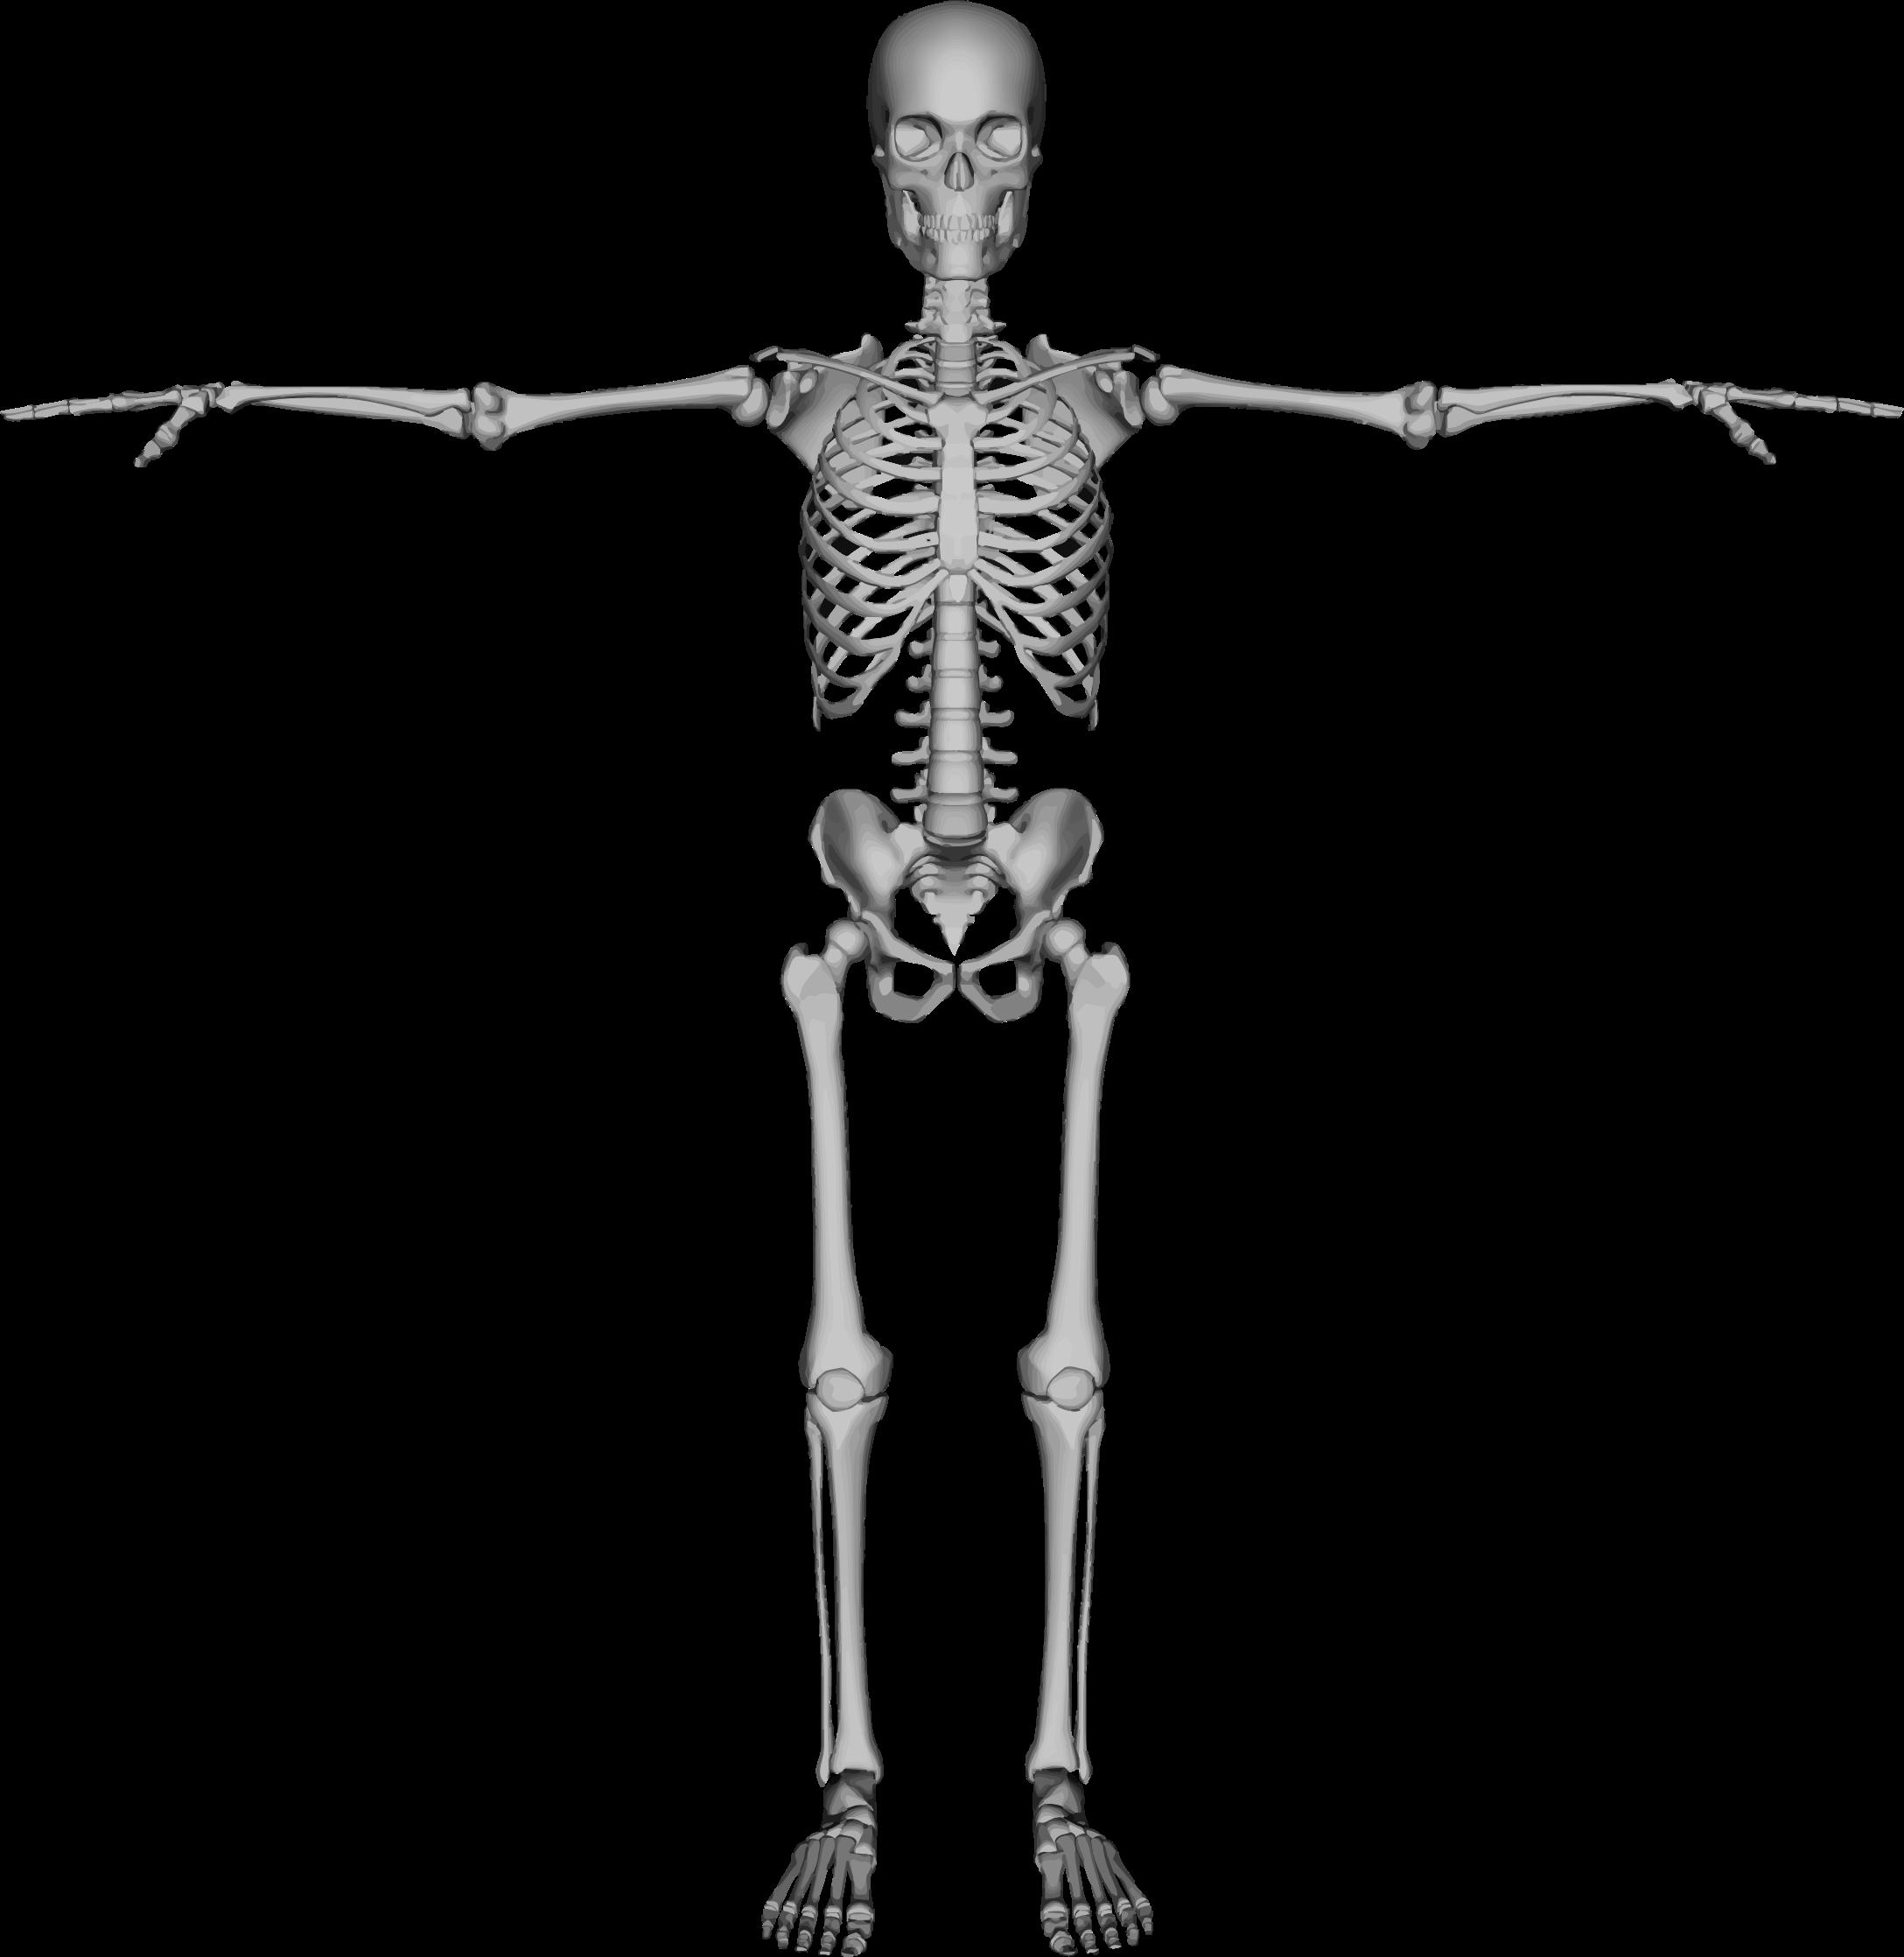 Halloween clipart skeleton image library stock Clipart - Skeleton With Arms Out image library stock